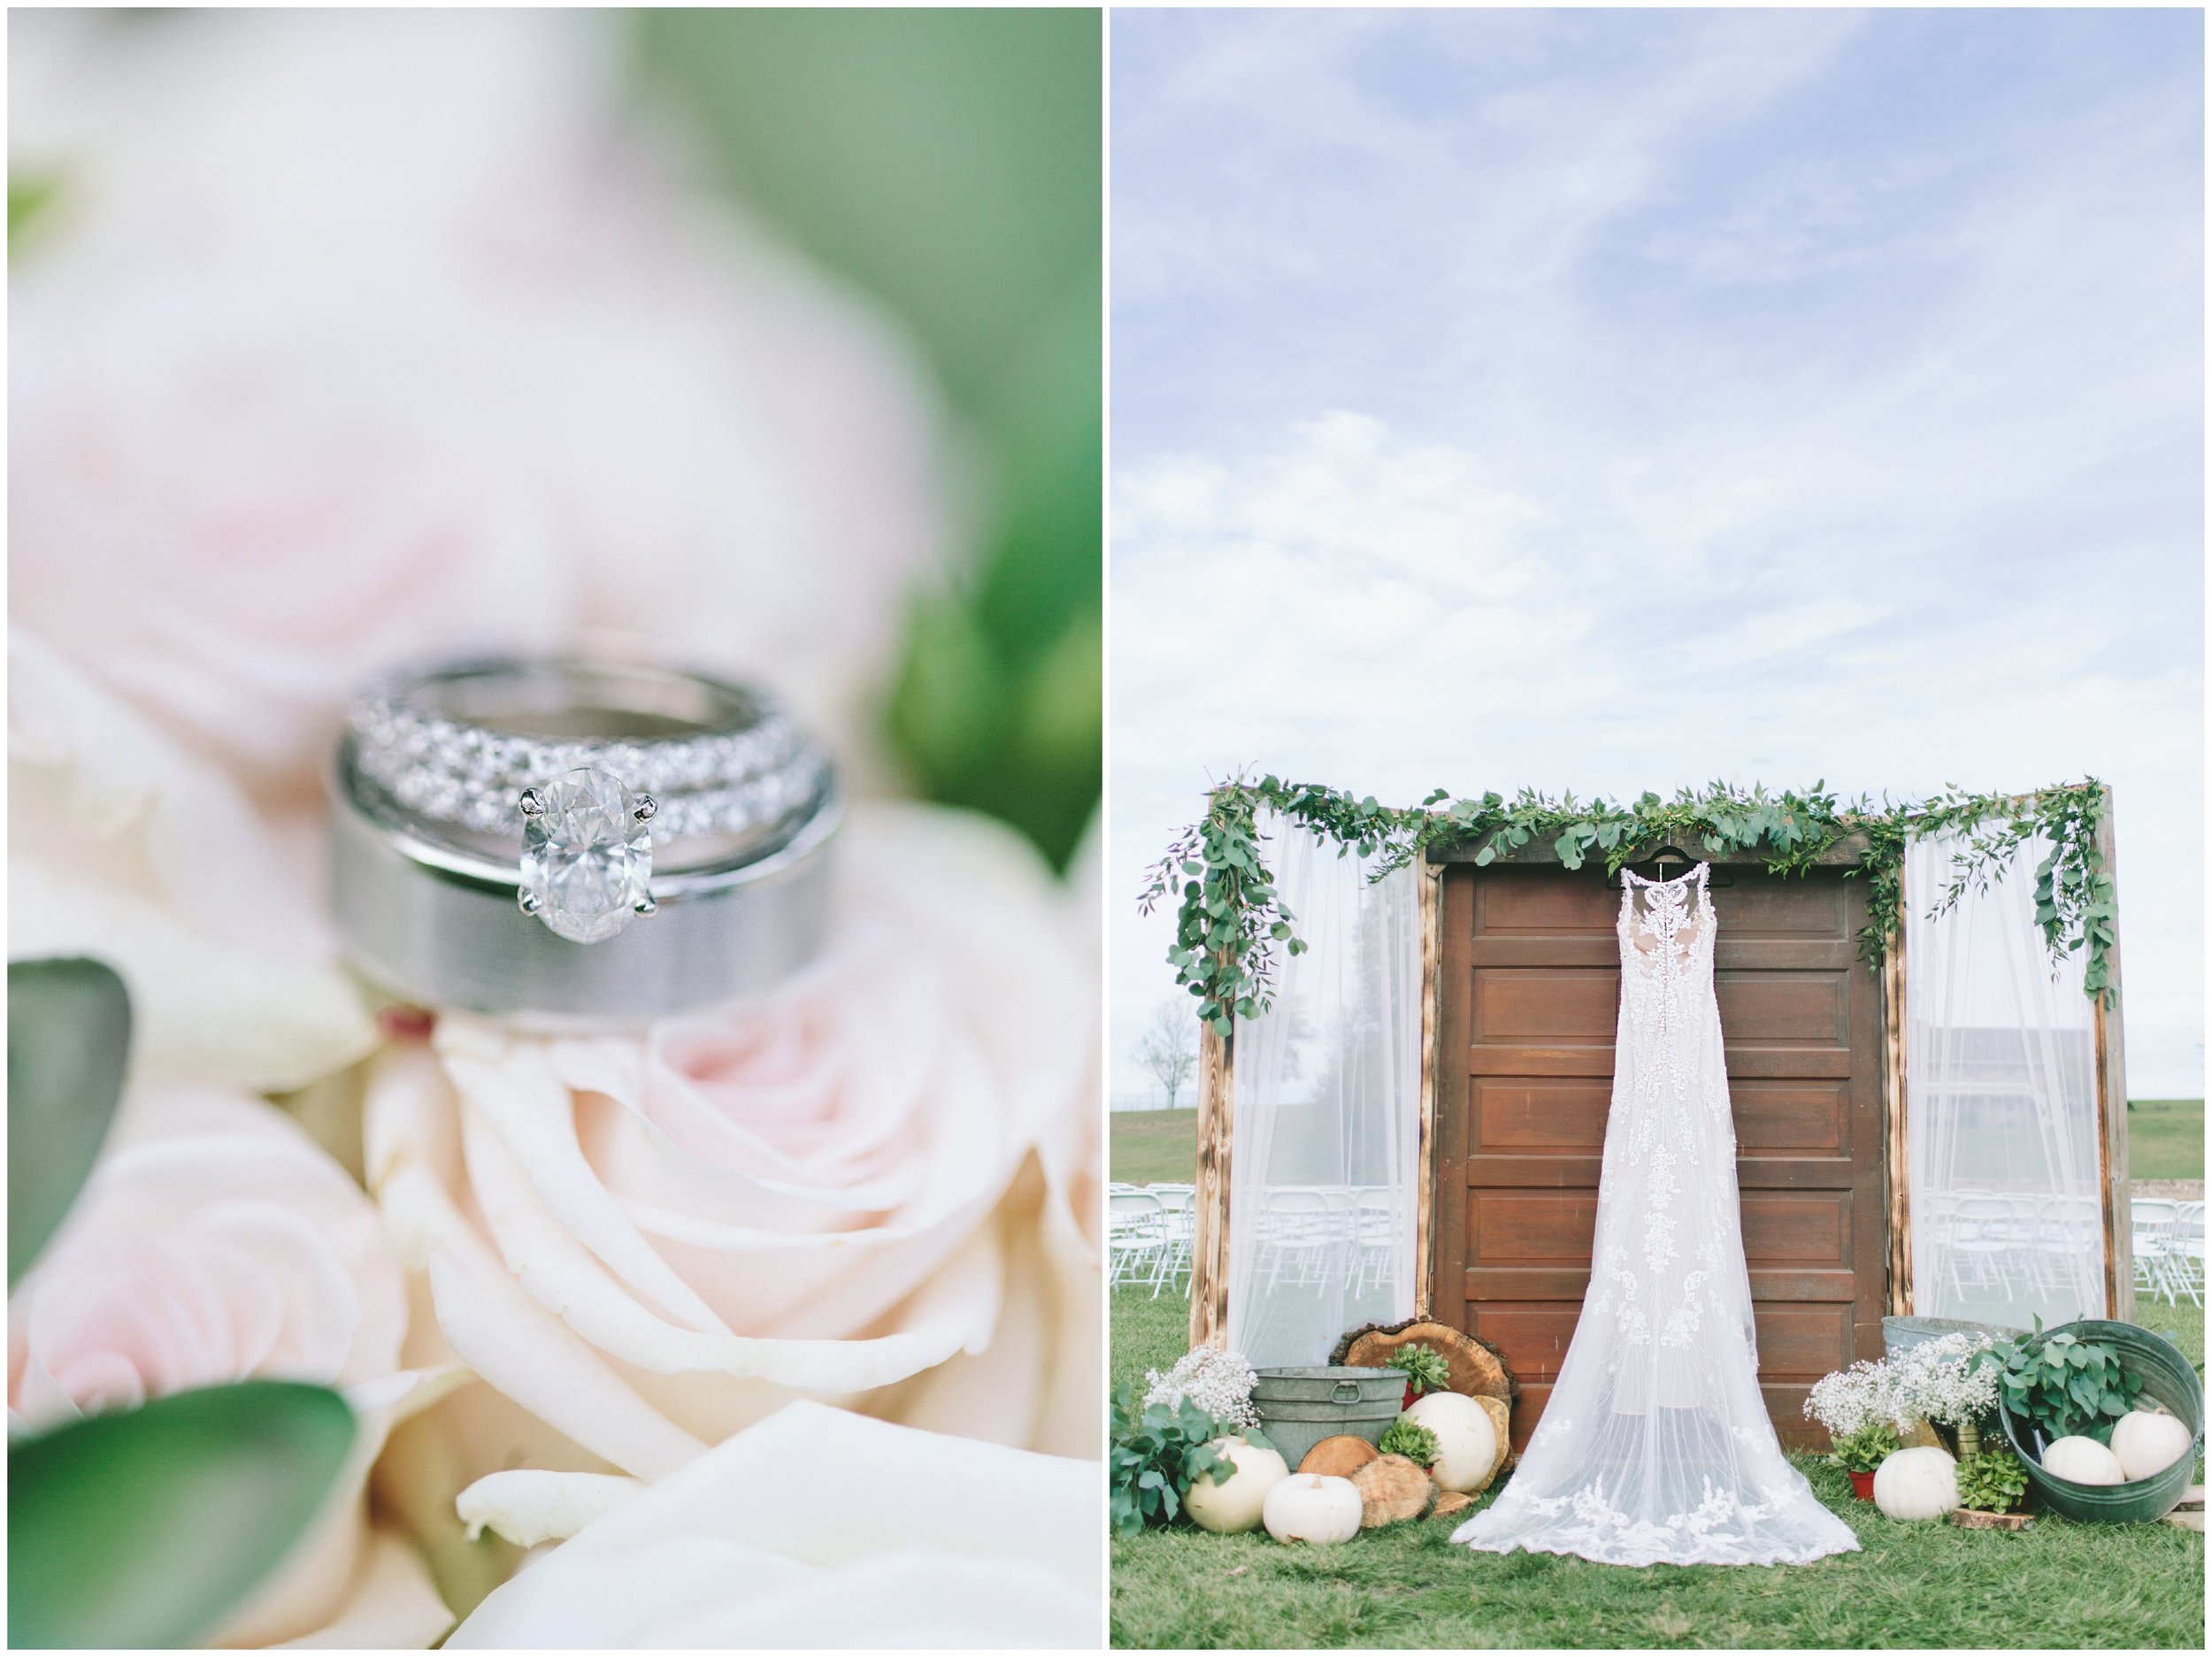 Indiana Wedding 4.JPG